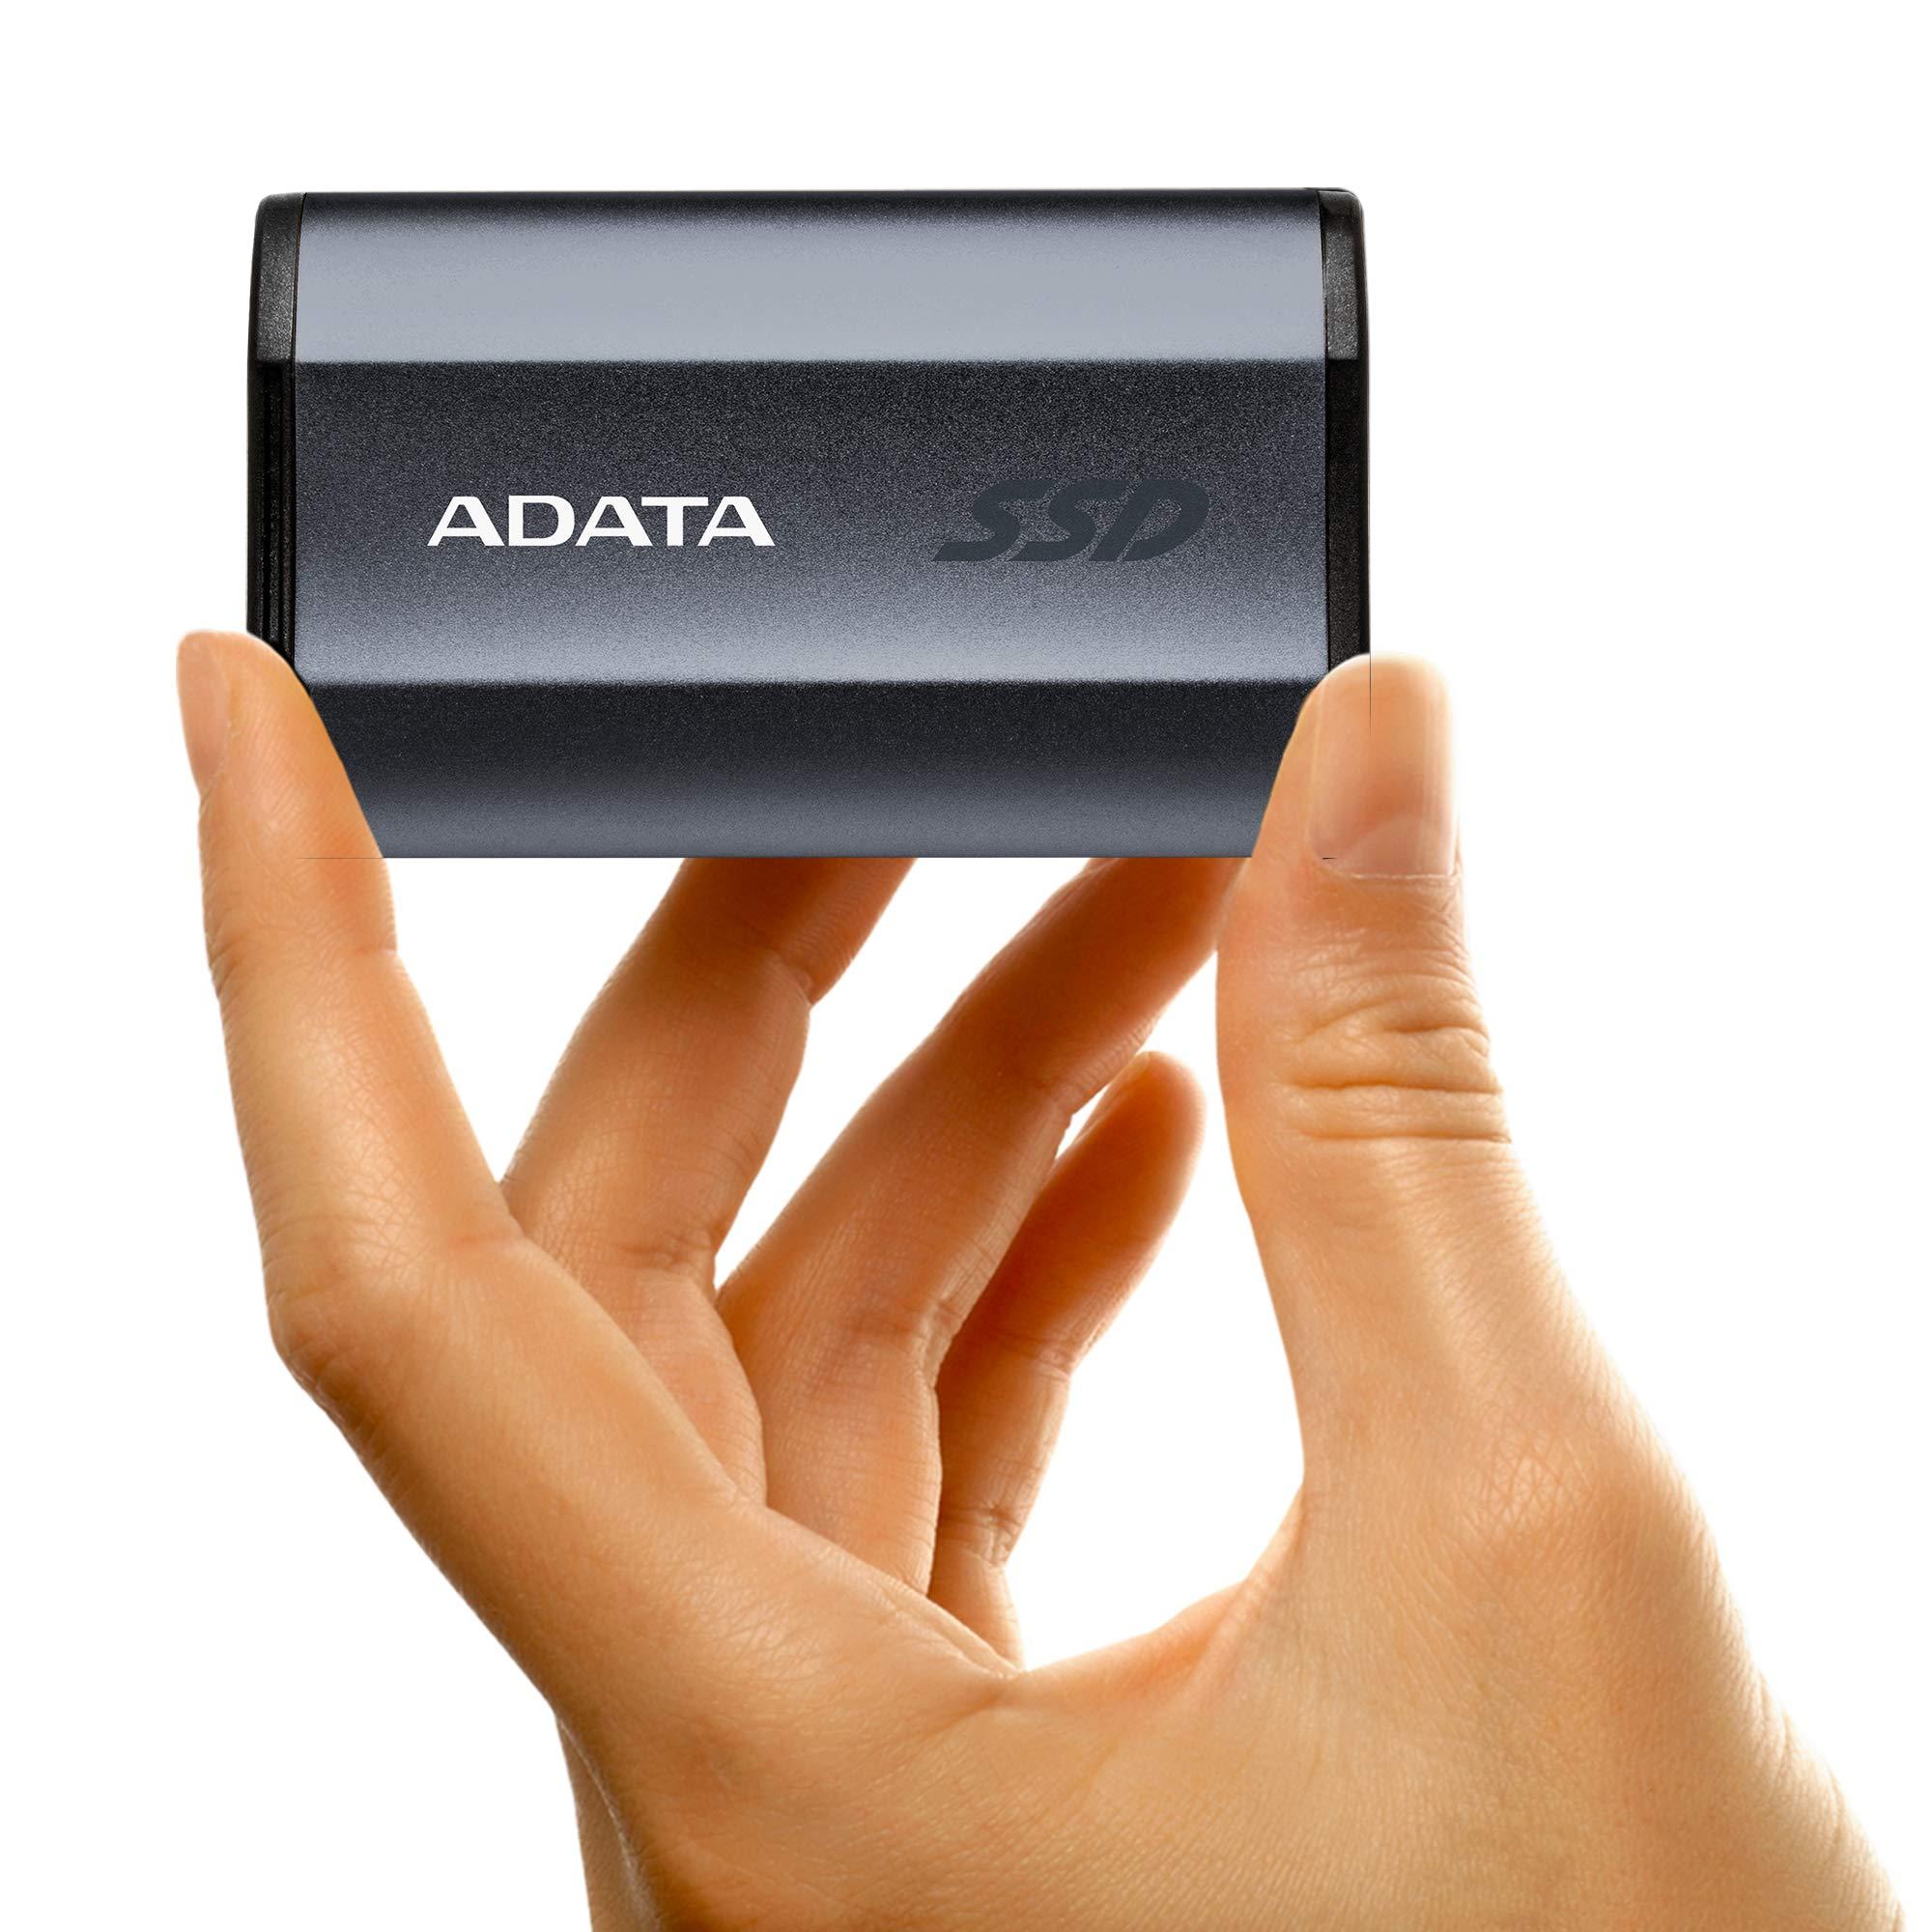 ADATA SE730H 1TB USB 3.1 Gen 2 Type-C Waterproof Shockproof Portable External Solid State Drive Grey (ASE730H-1TU31-CTI) by ADATA (Image #4)